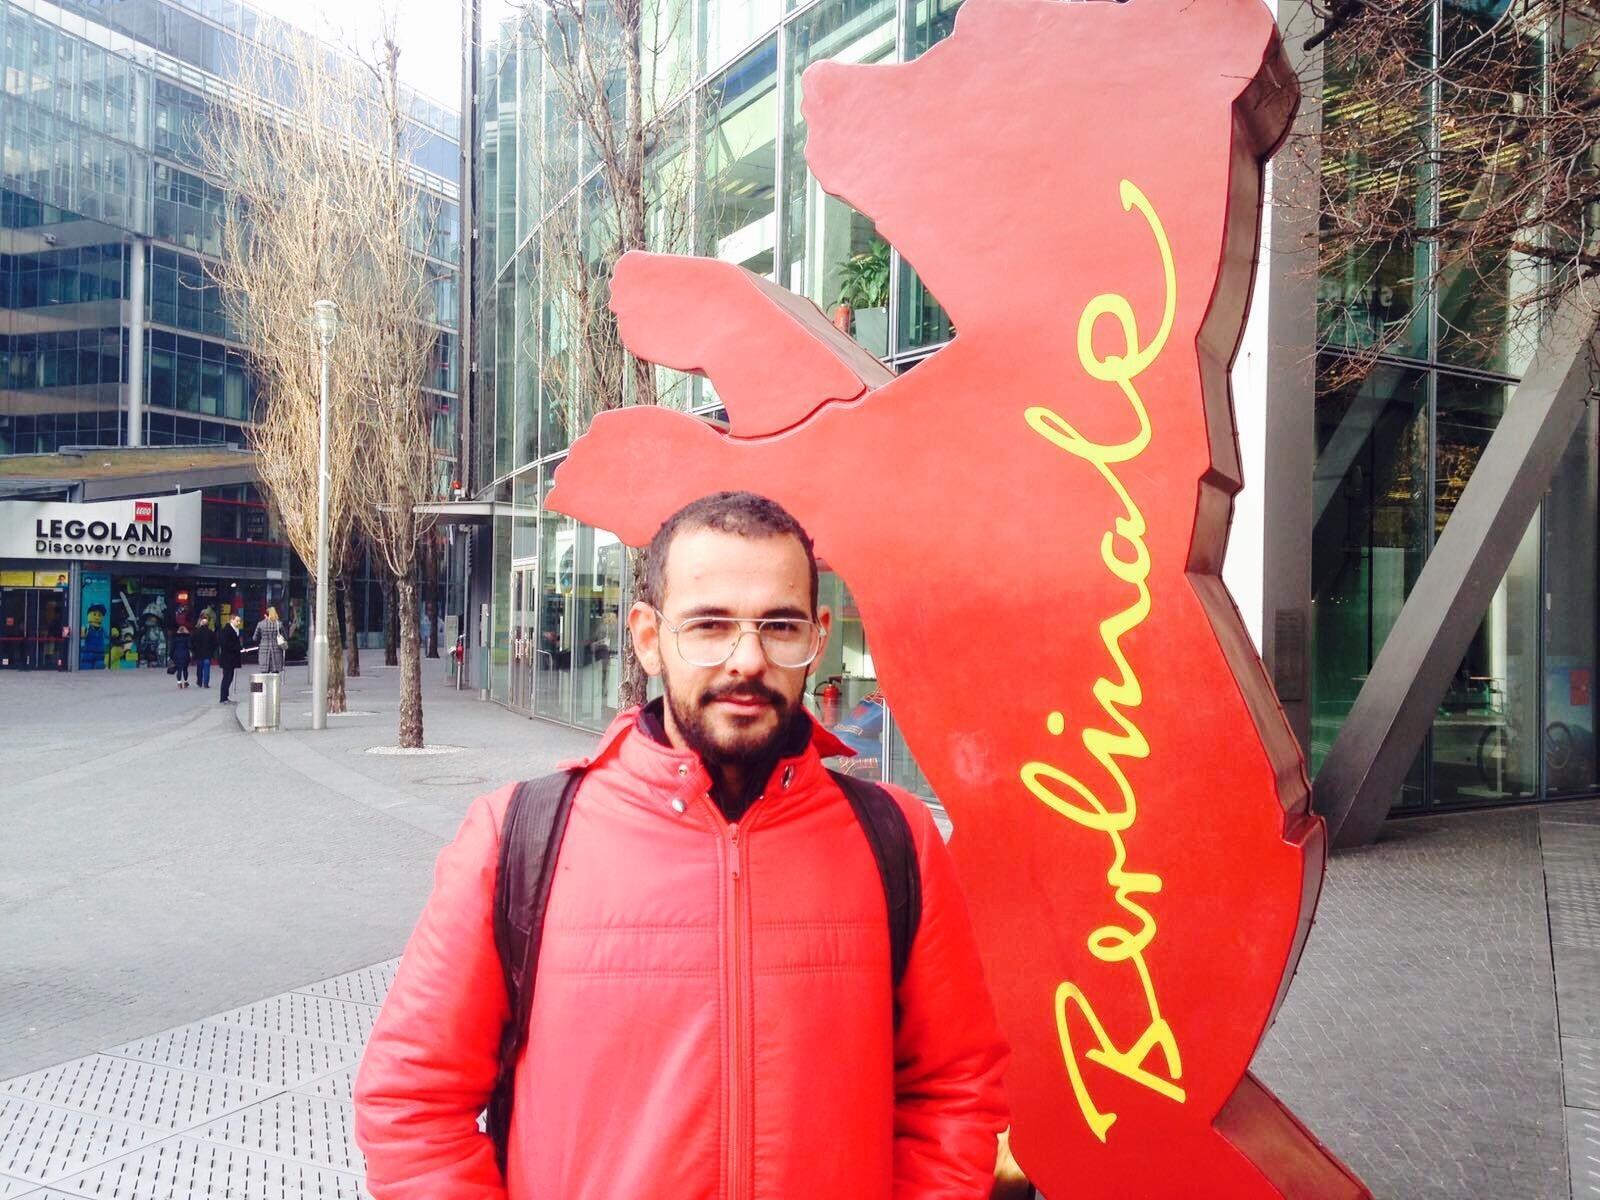 O cineasta Marco Antonio Pereira apresenta seu segundo curta na Berlinale